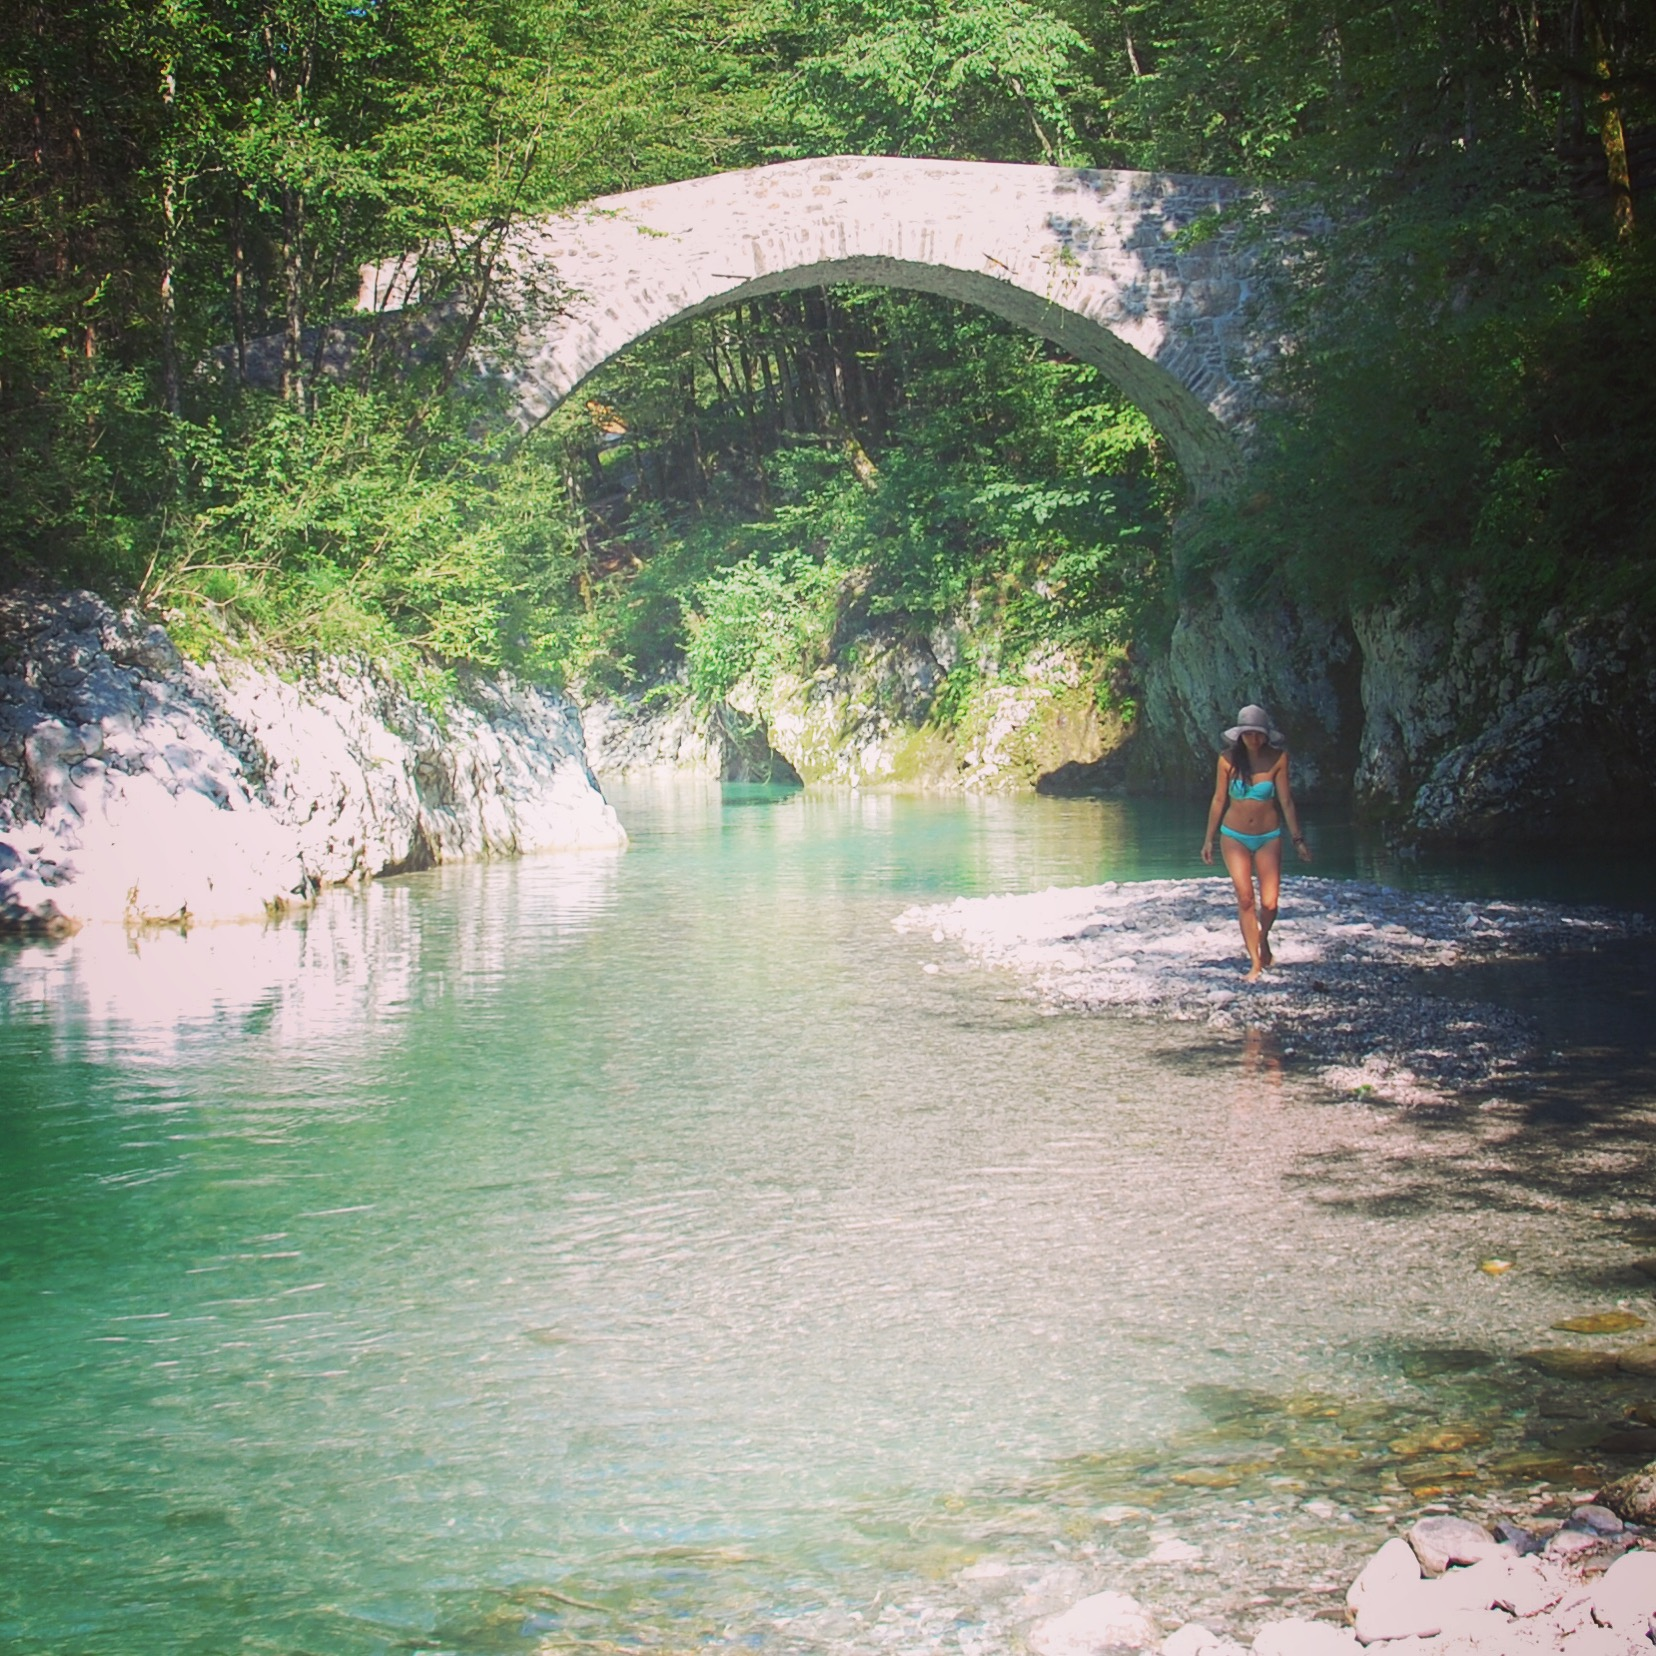 Another great hidden spot to hang out was   Nadiža Stream   along the Italian-Slovenian border.